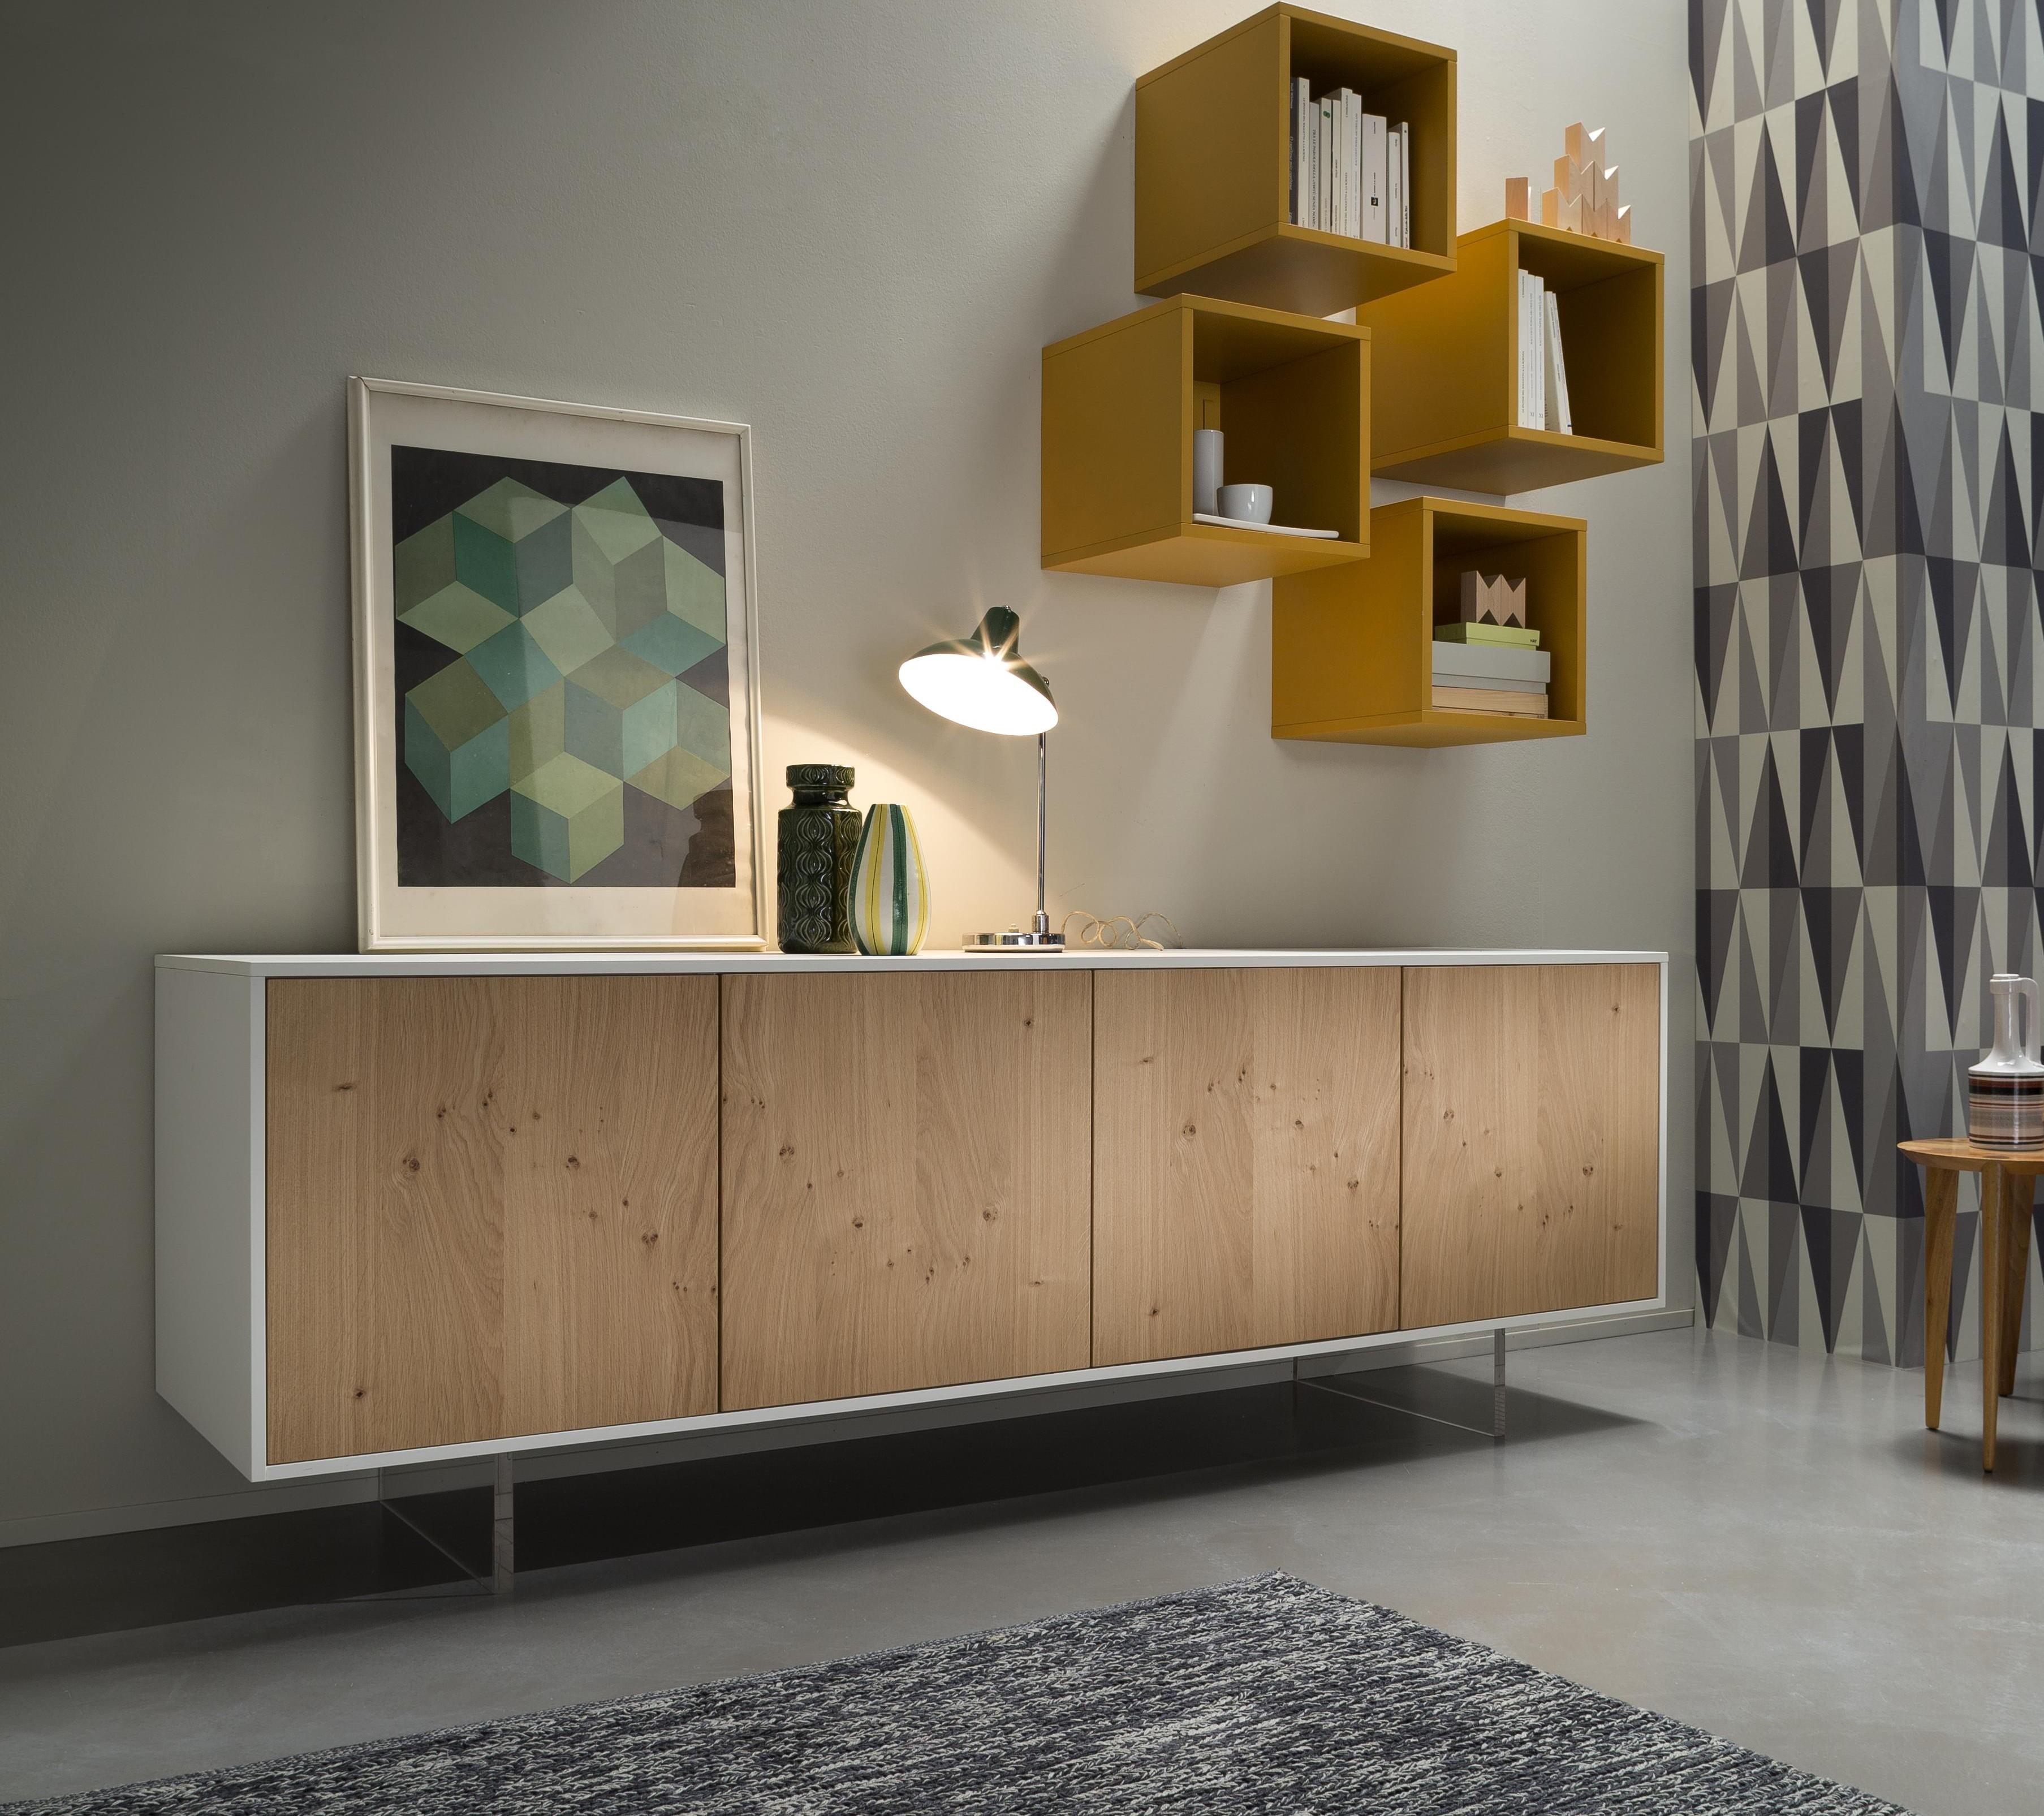 Arredamento casa online vendita mobili online made in for Vendita mobili design on line